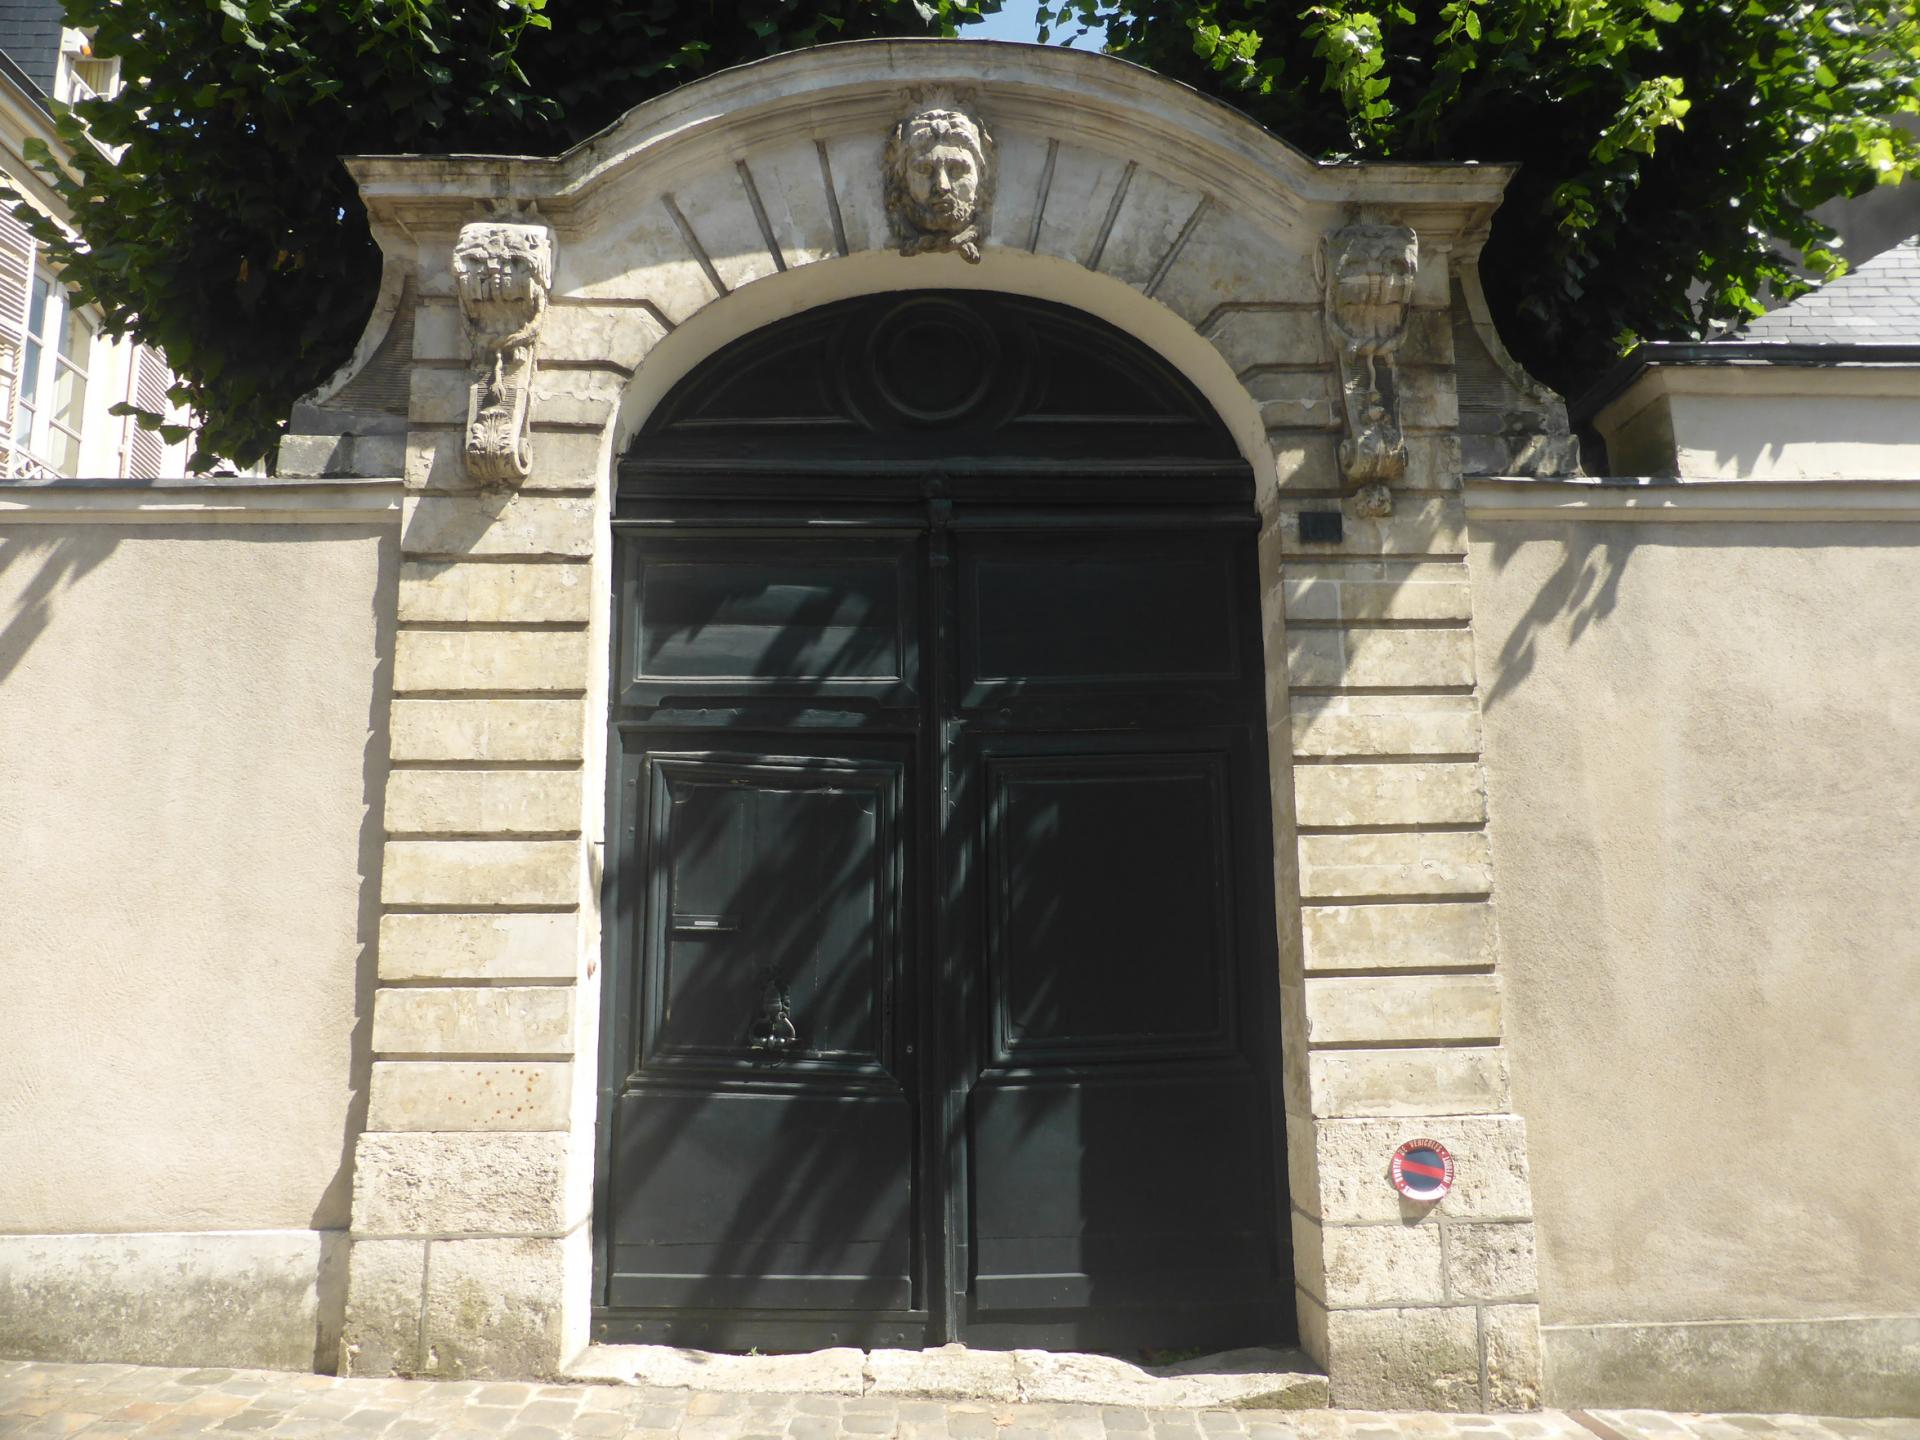 Châteaudun, portail d'hôtel particulier, XVIIIe siècle, cl. Ph. Cachau